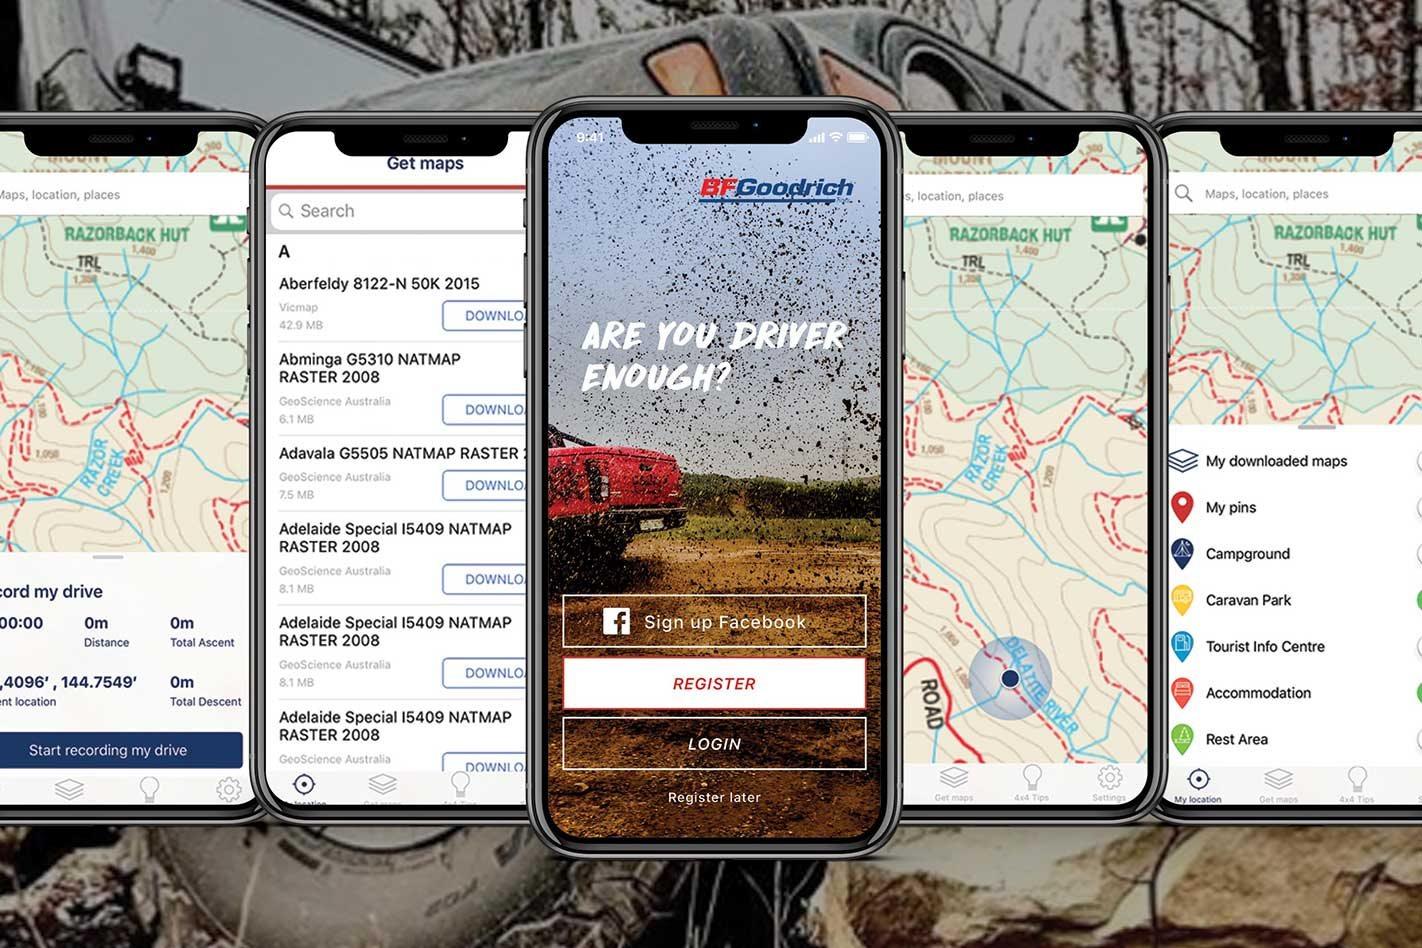 Bfgoodrich S Free Off Road Escape App